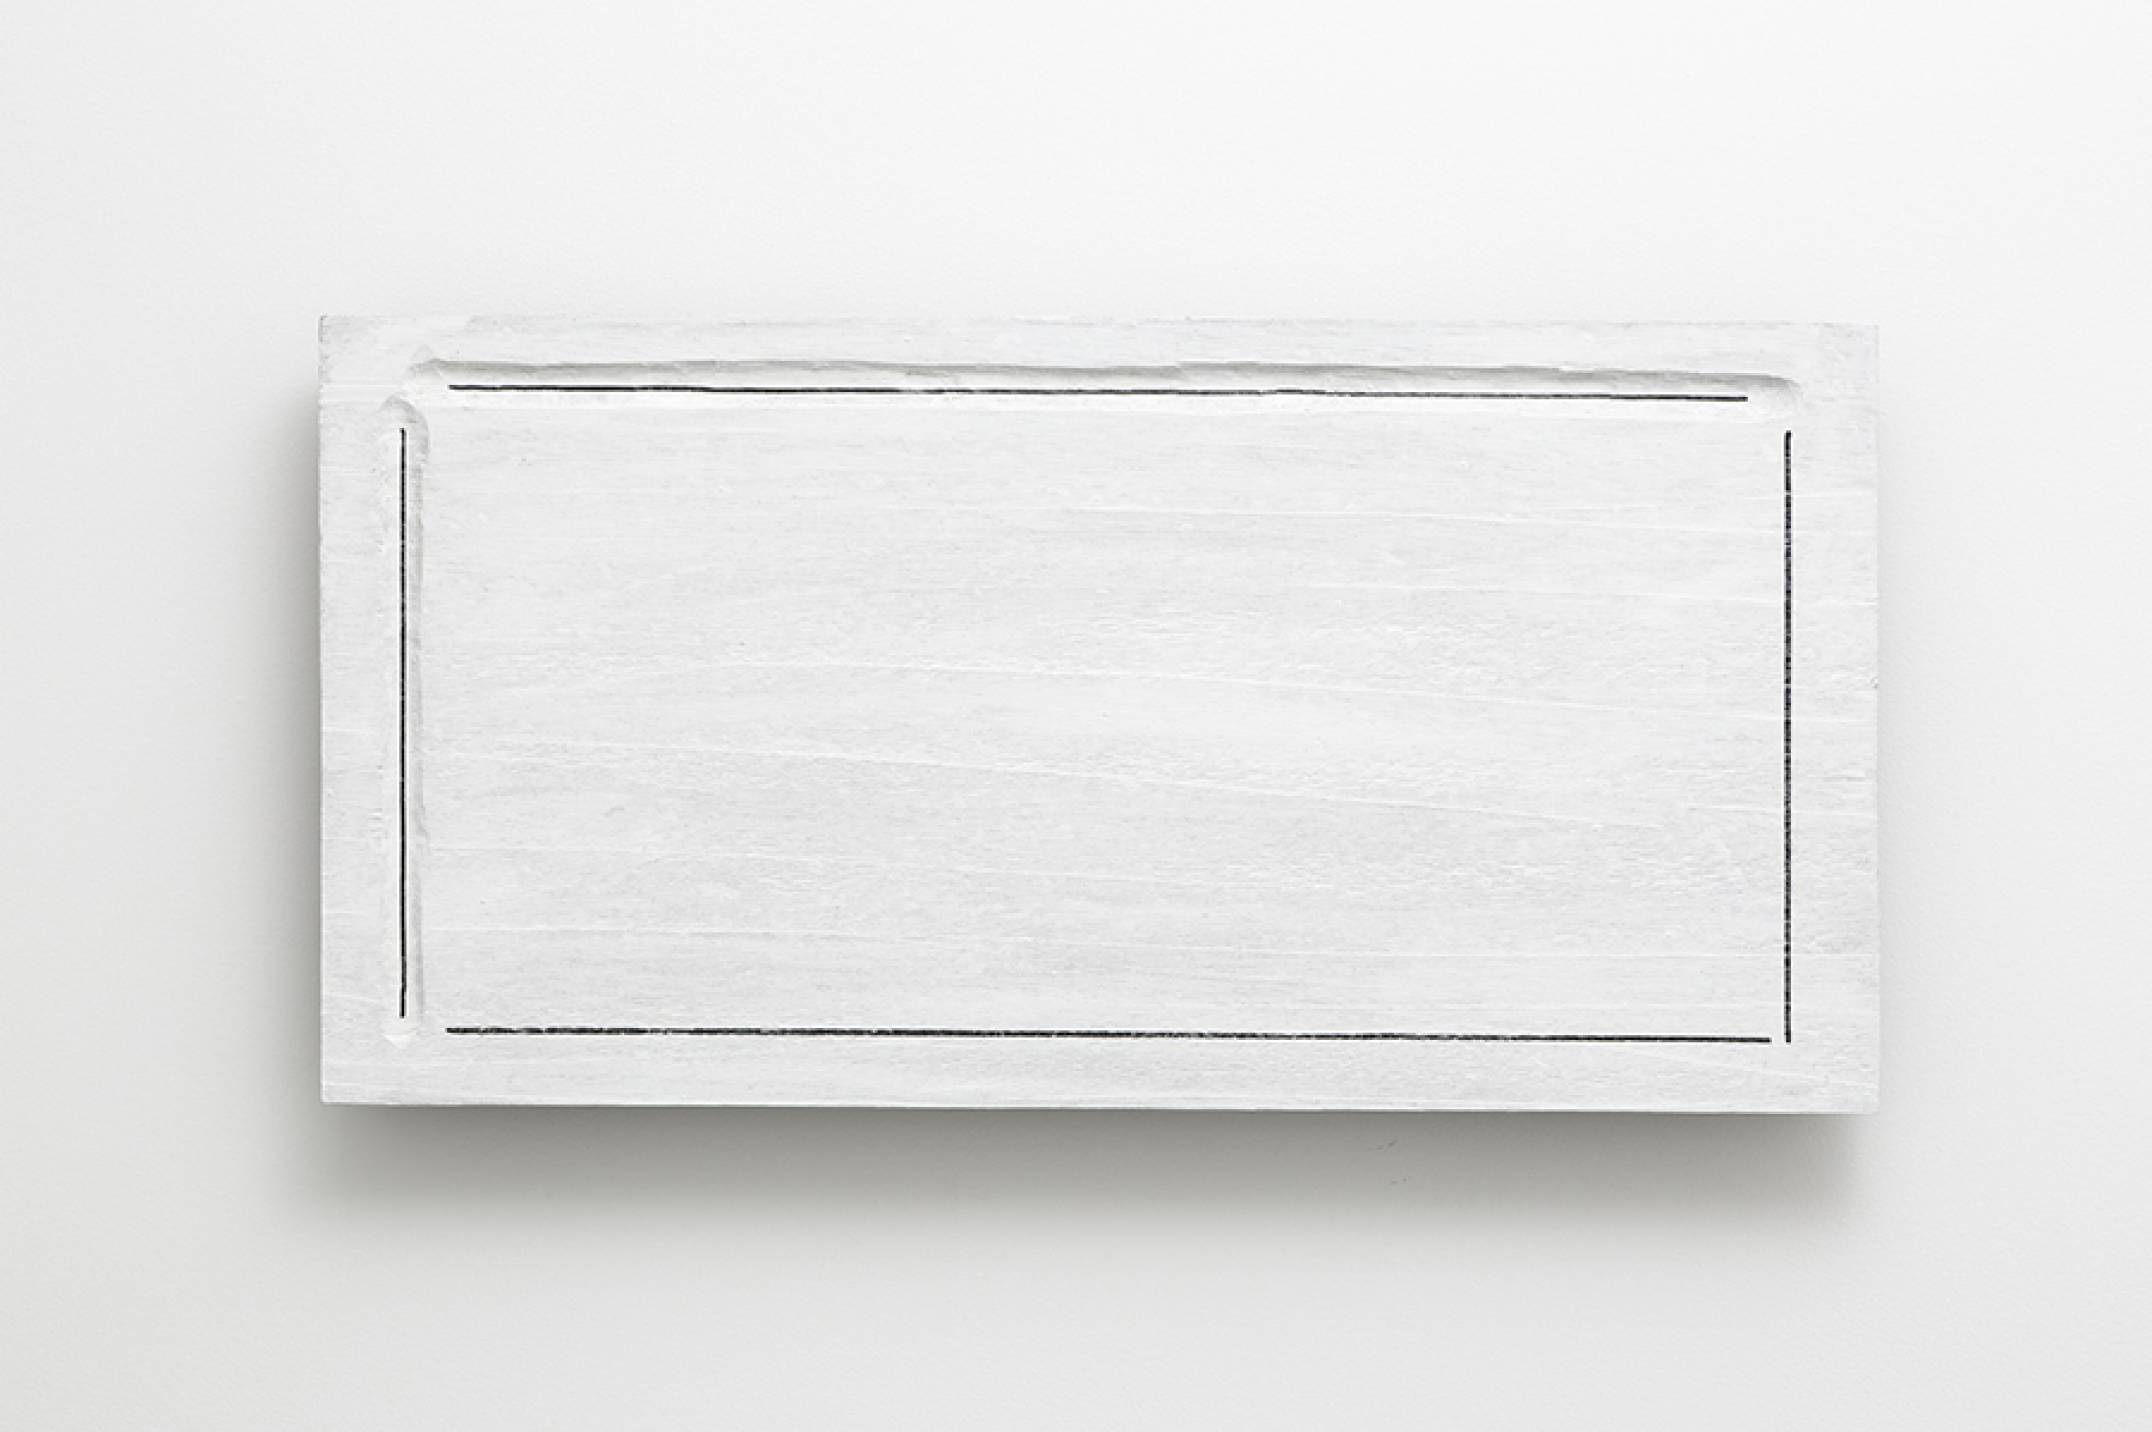 Kishio Suga,&nbsp;<em>Enclosed Condition</em>, 1977,&nbsp;wood, paint, marker pen, varnish, 35,6 × 69,9 × 5,4 cm - Mendes Wood DM